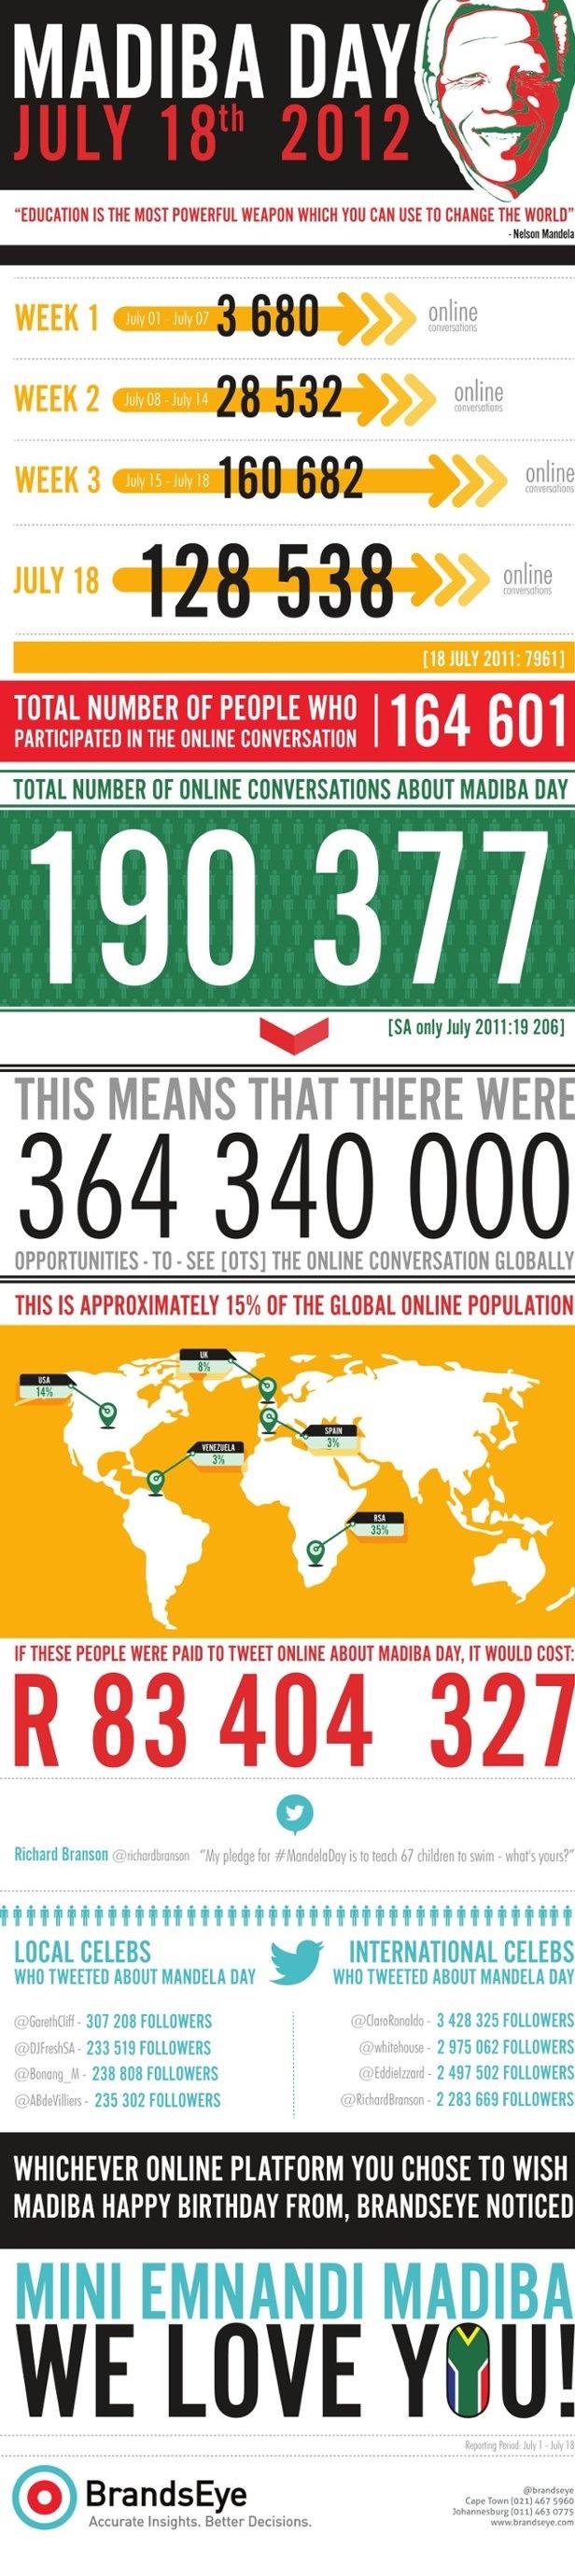 Nelson mandela day july 18 2012 as celebrated online around the world